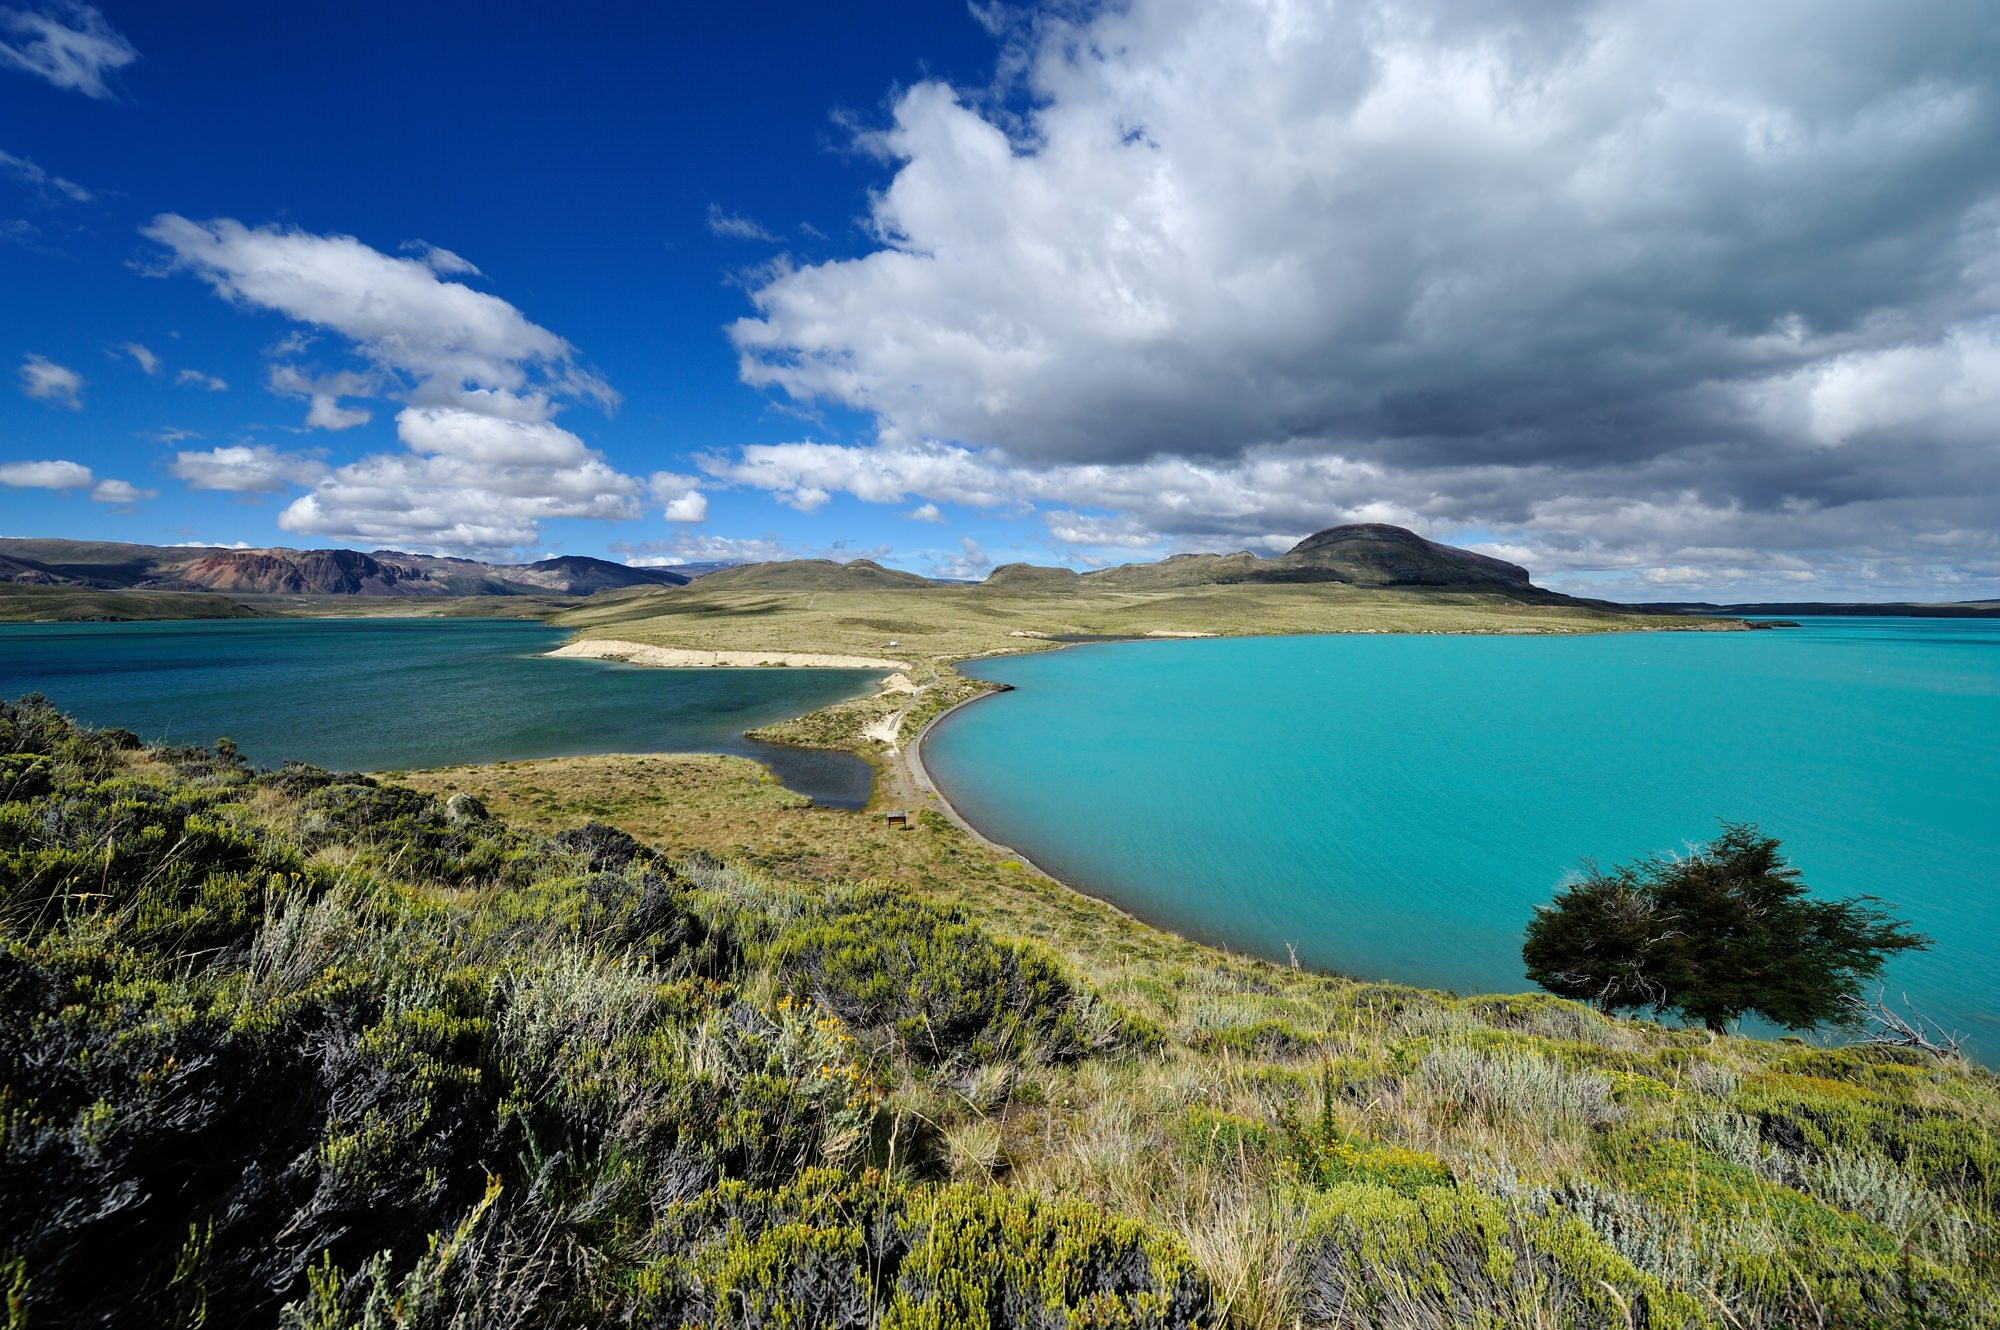 Patagonien - Granit und Eis